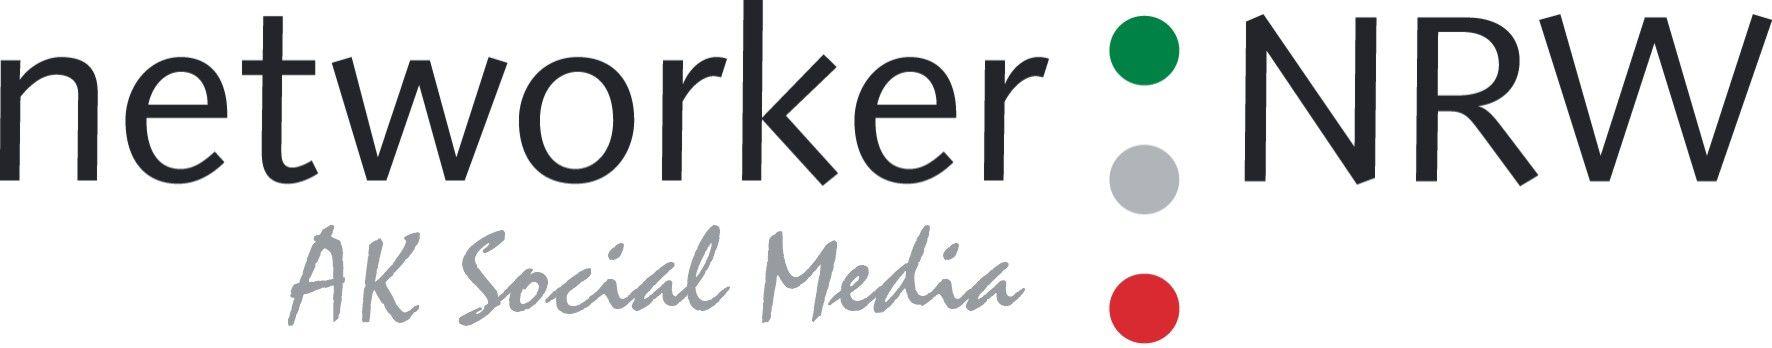 koelnkomm socialmedia ist Gründungsmitglied im Arbeitskreis Social Media der Networker NRW